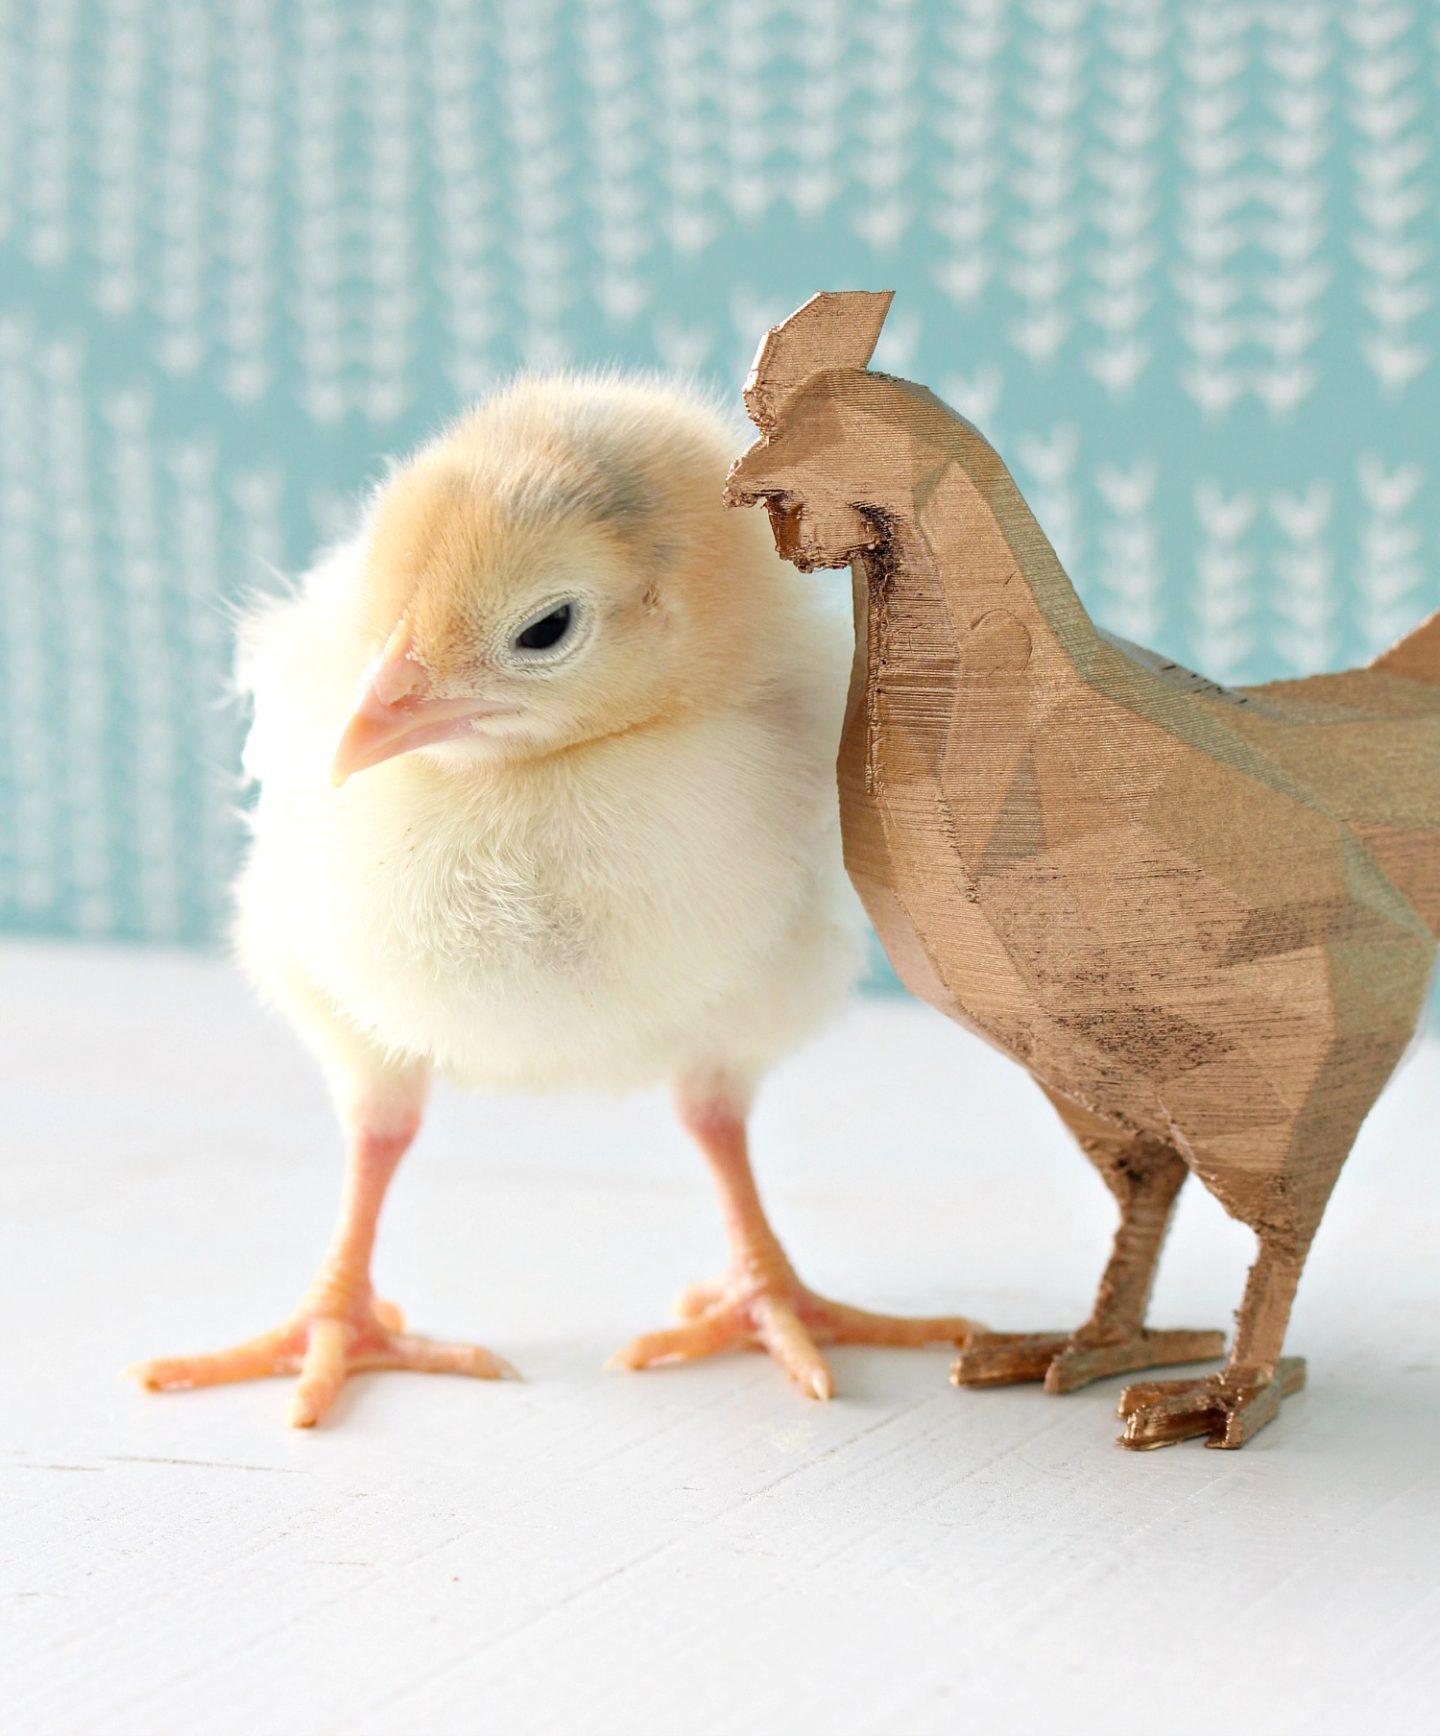 3D Printed Chicken